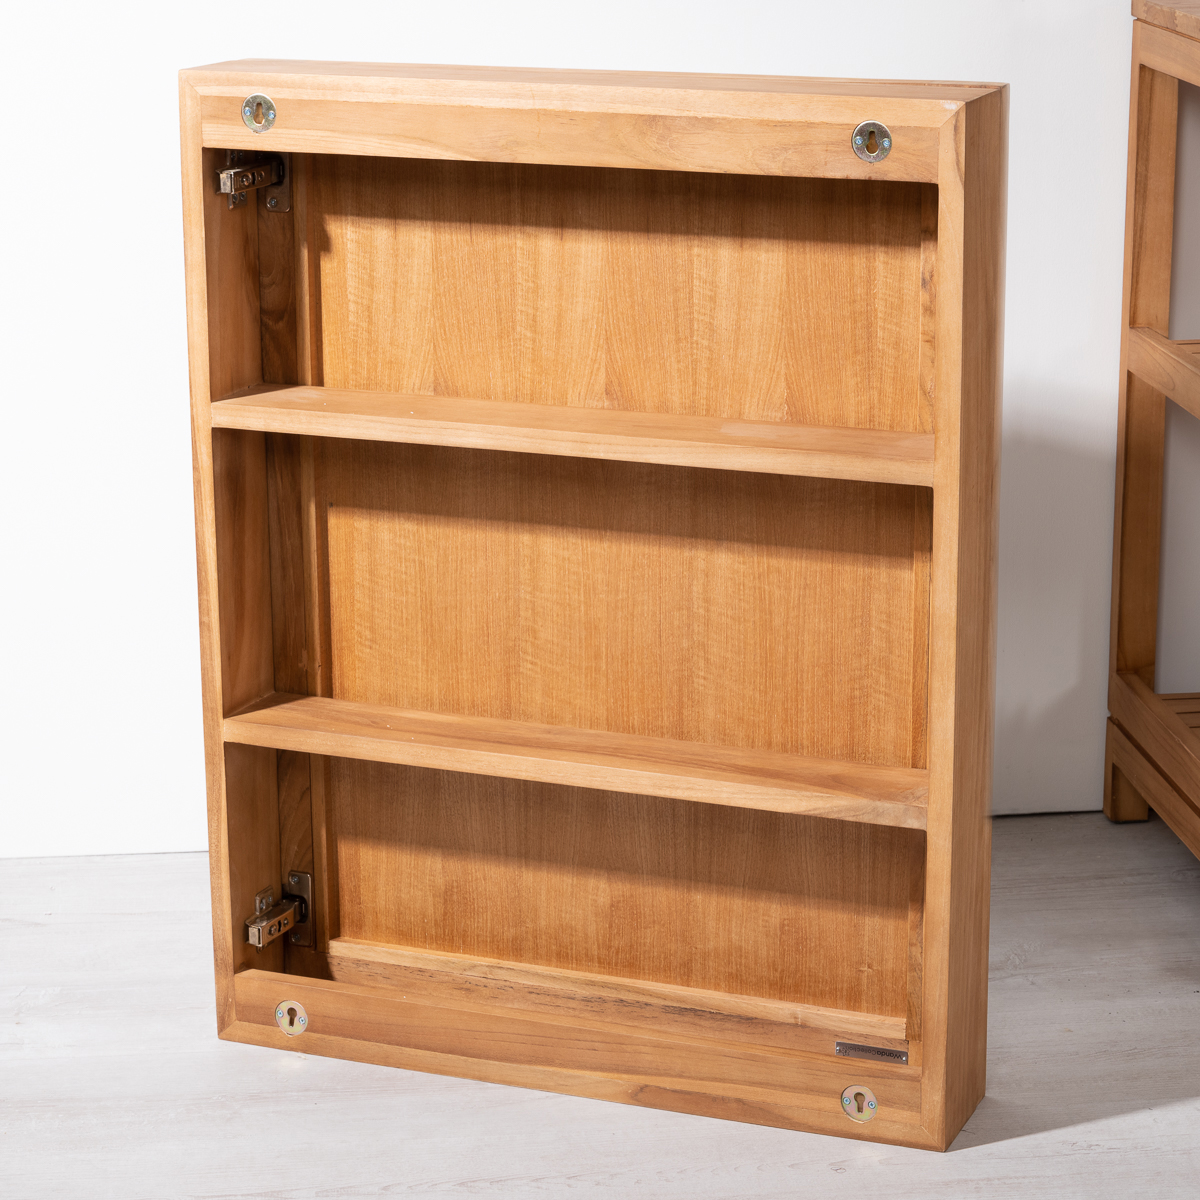 Miroir teck miroir armoire de toilette en bois massif - Wanda collection ...